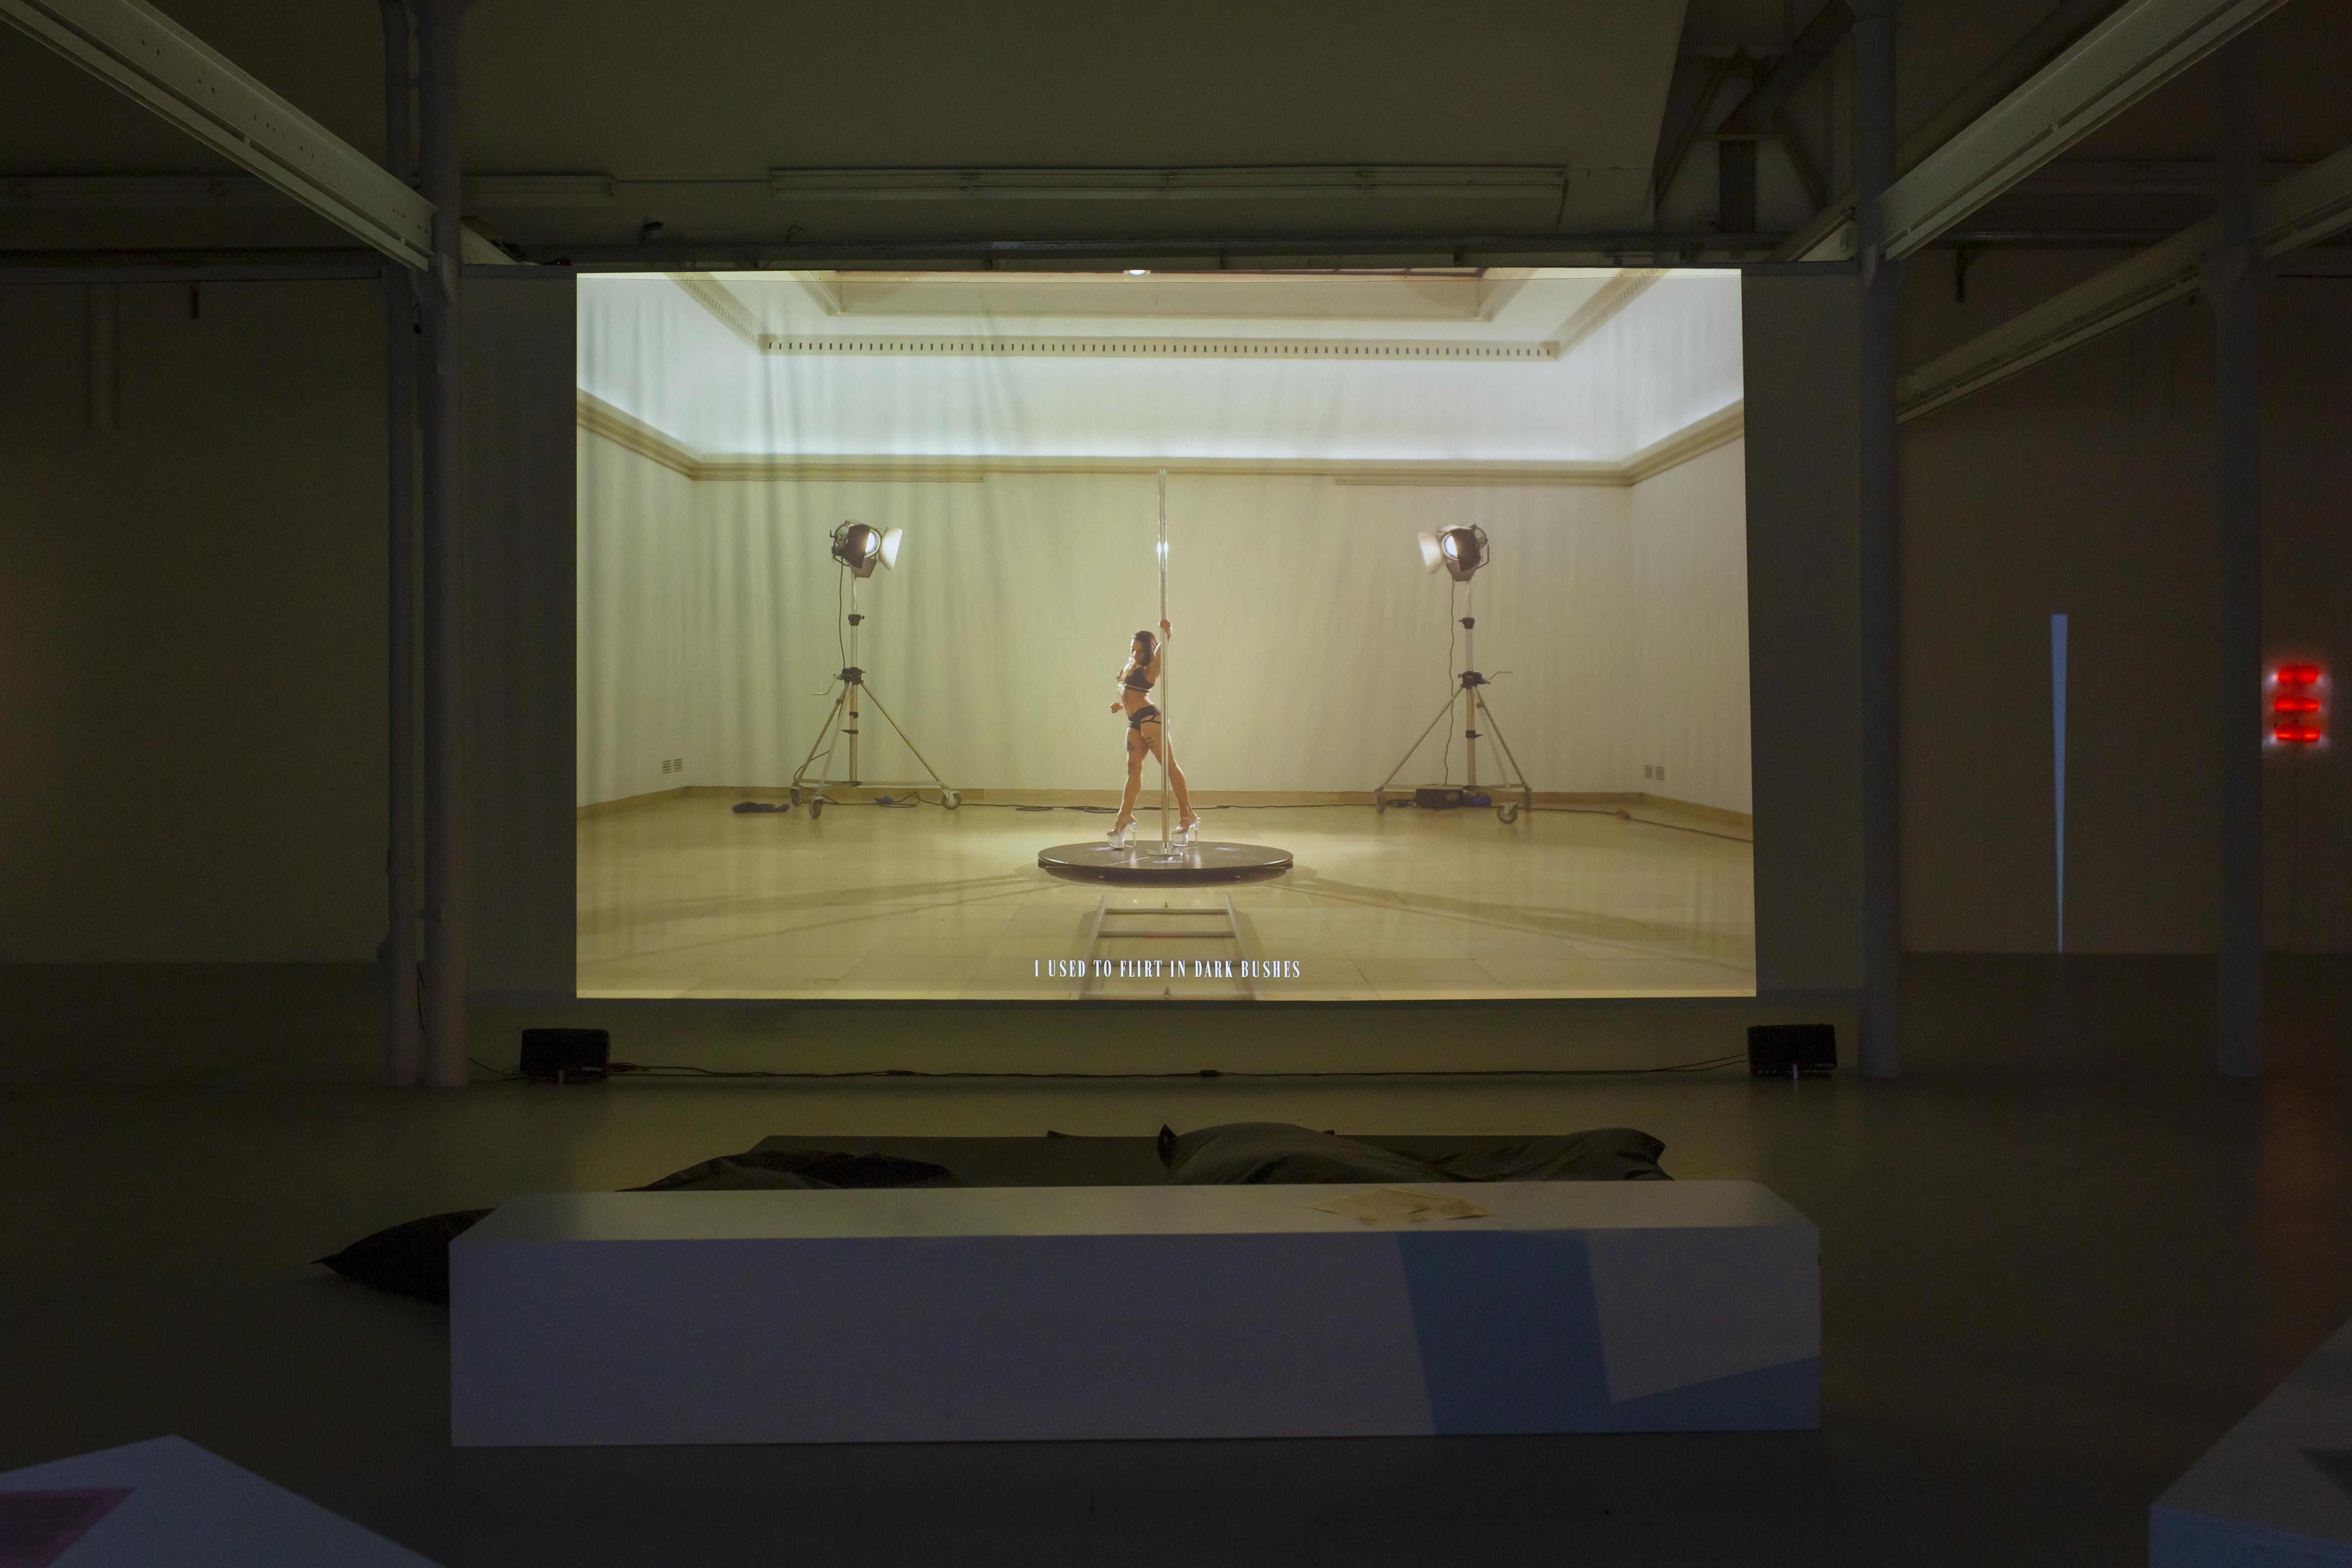 Tarek Lakhrissi, Spiraling, 2021. HD Single Channel Video, 4:3. 00:07:00. Edition 5 (+1AP). Installation view at Shedhalle, Zürich, CH. Photographer: Carla Schleiffer.